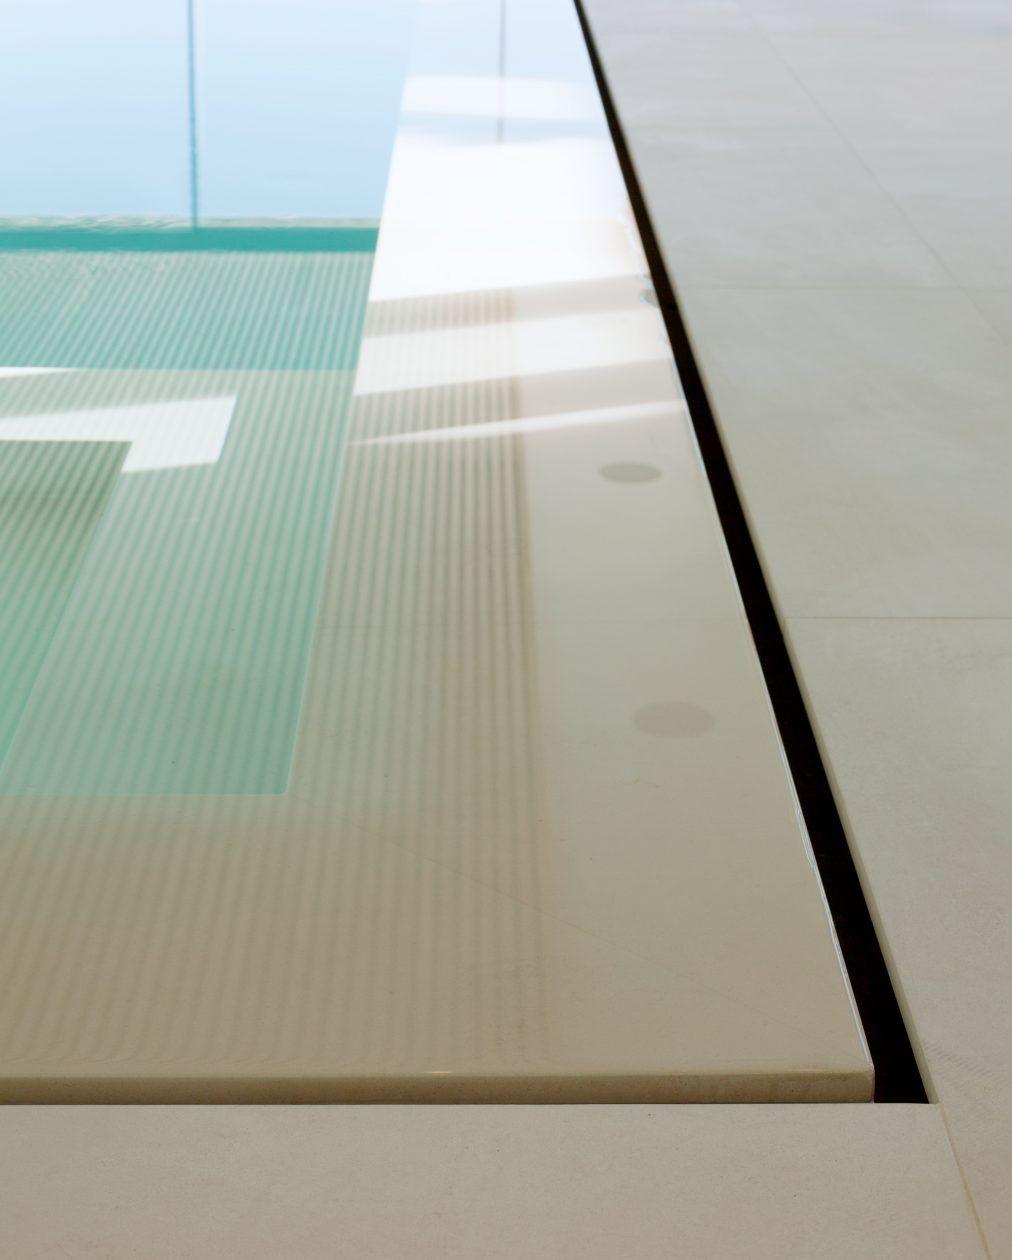 Swimmingpool mit Überlauf